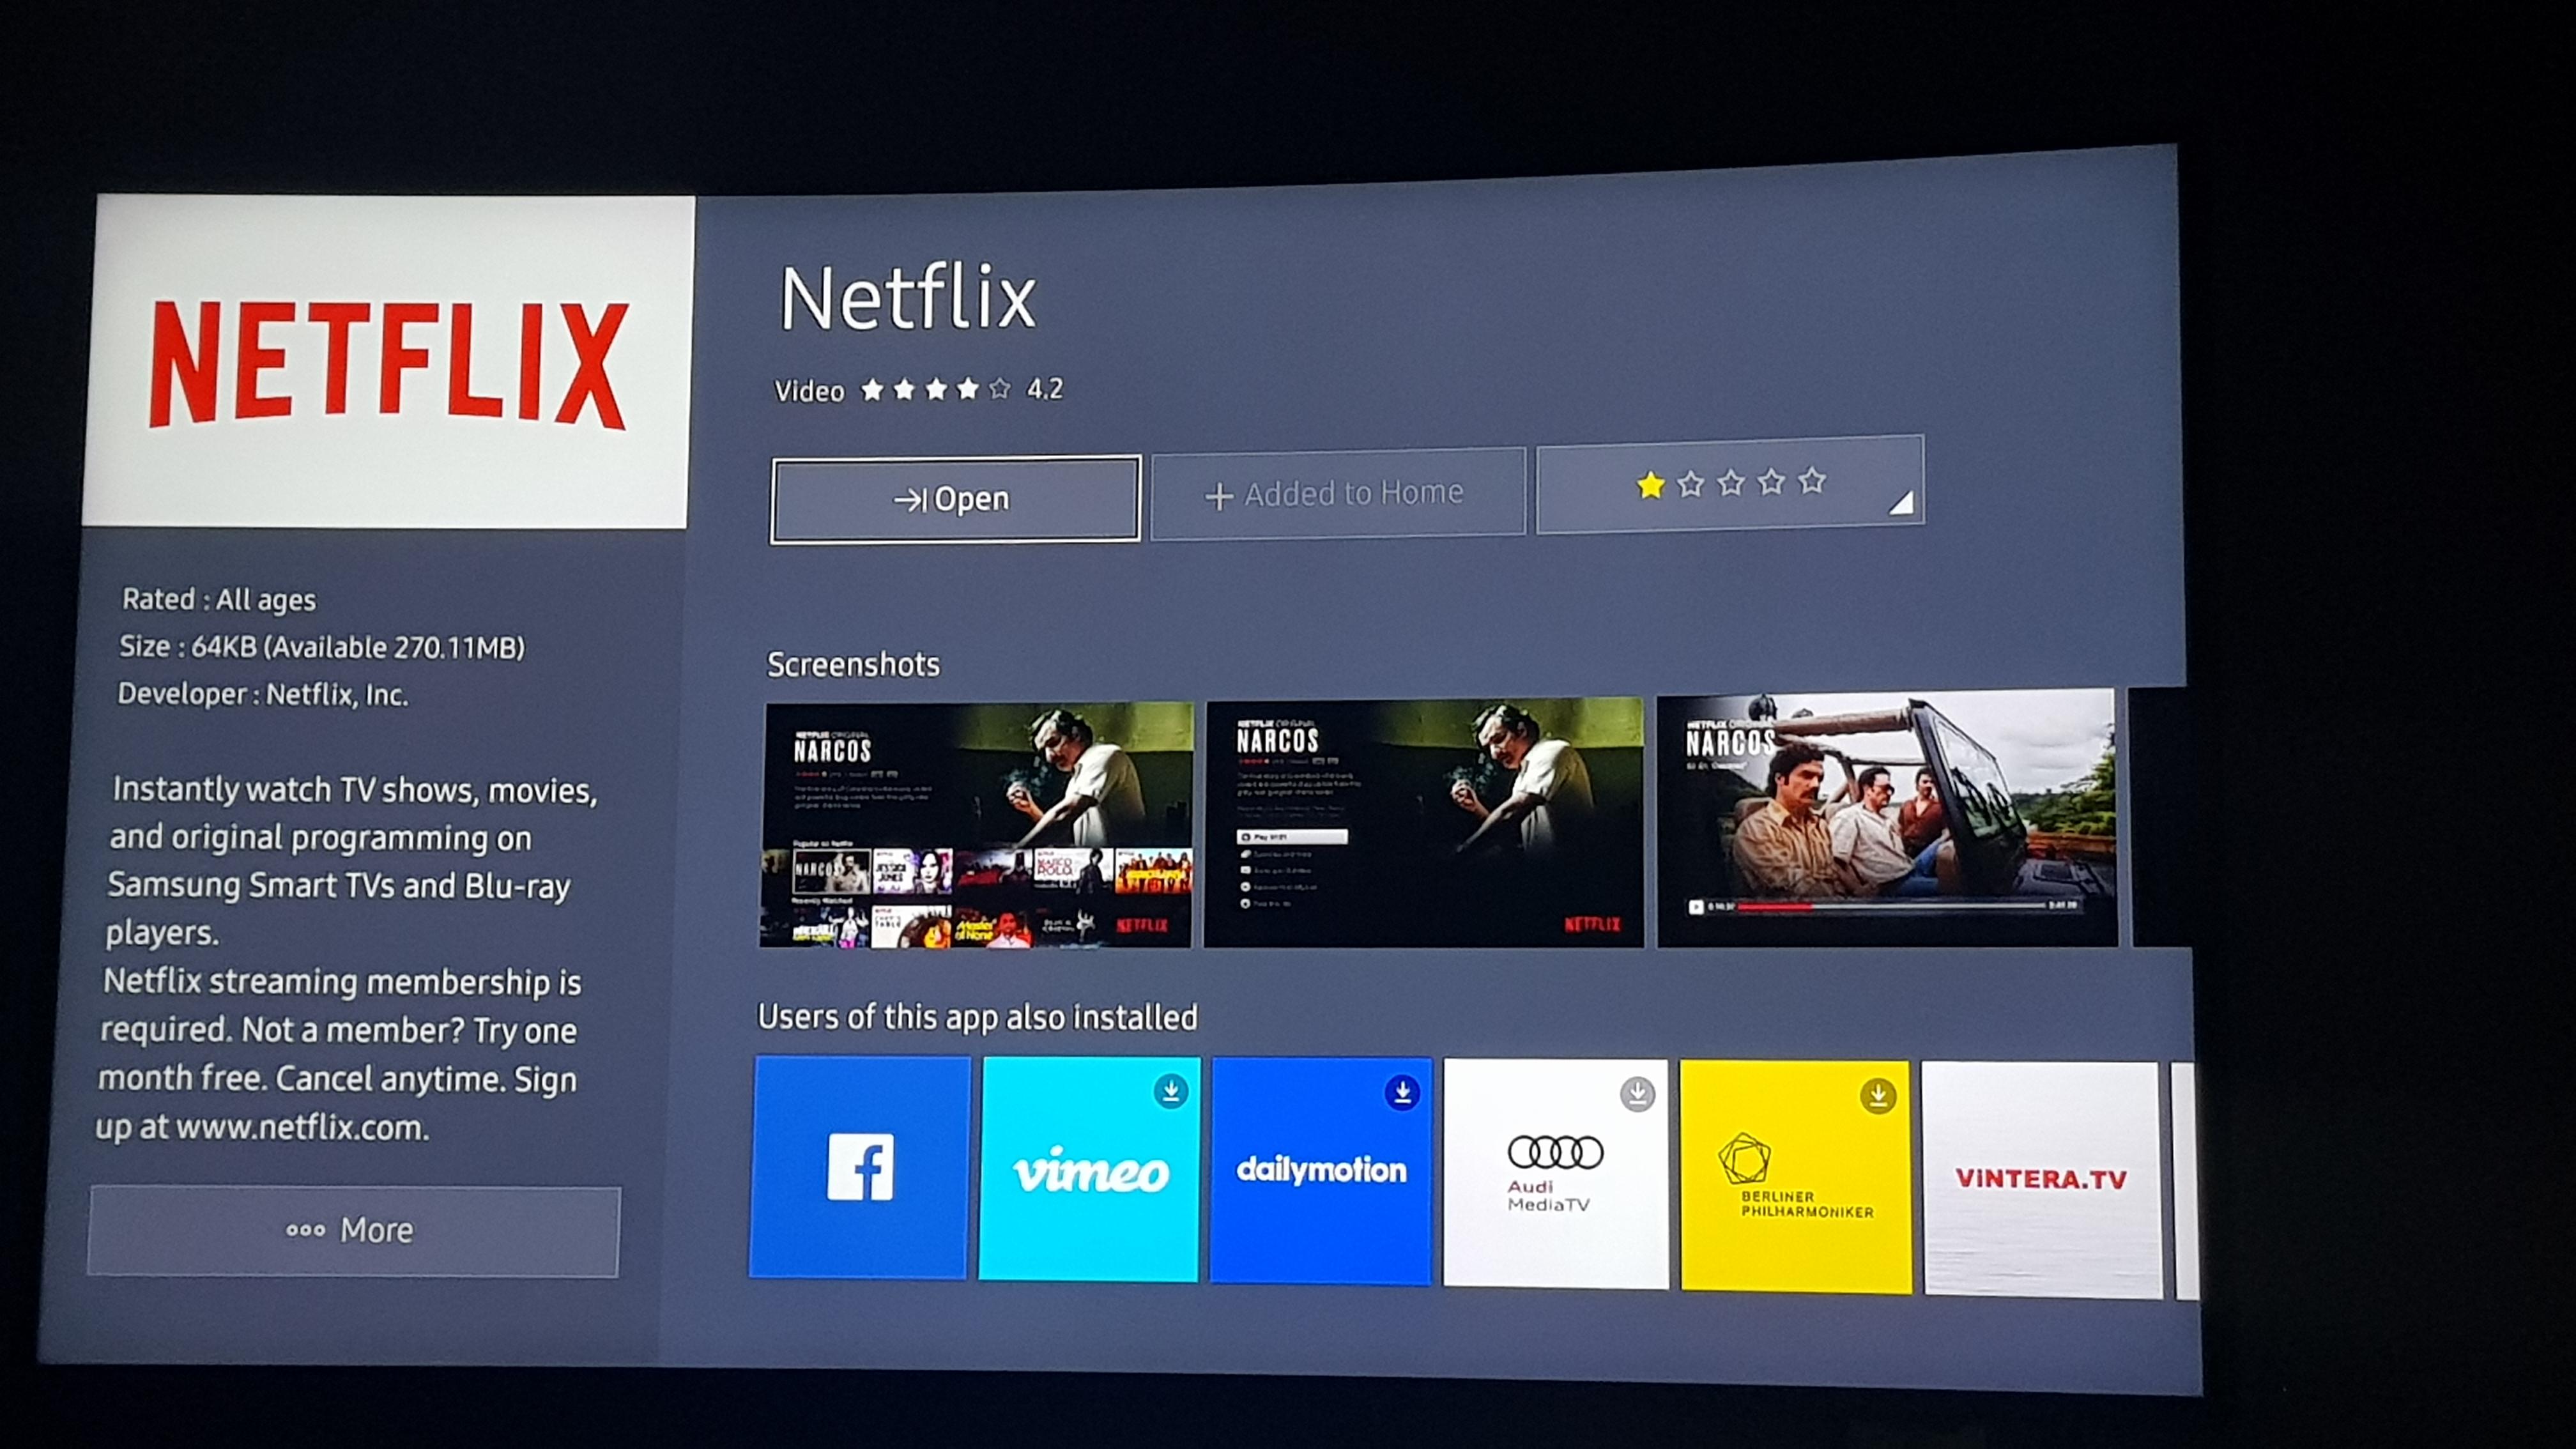 netflix 4k uhd content for apple tv 4k hdr axeetech. Black Bedroom Furniture Sets. Home Design Ideas